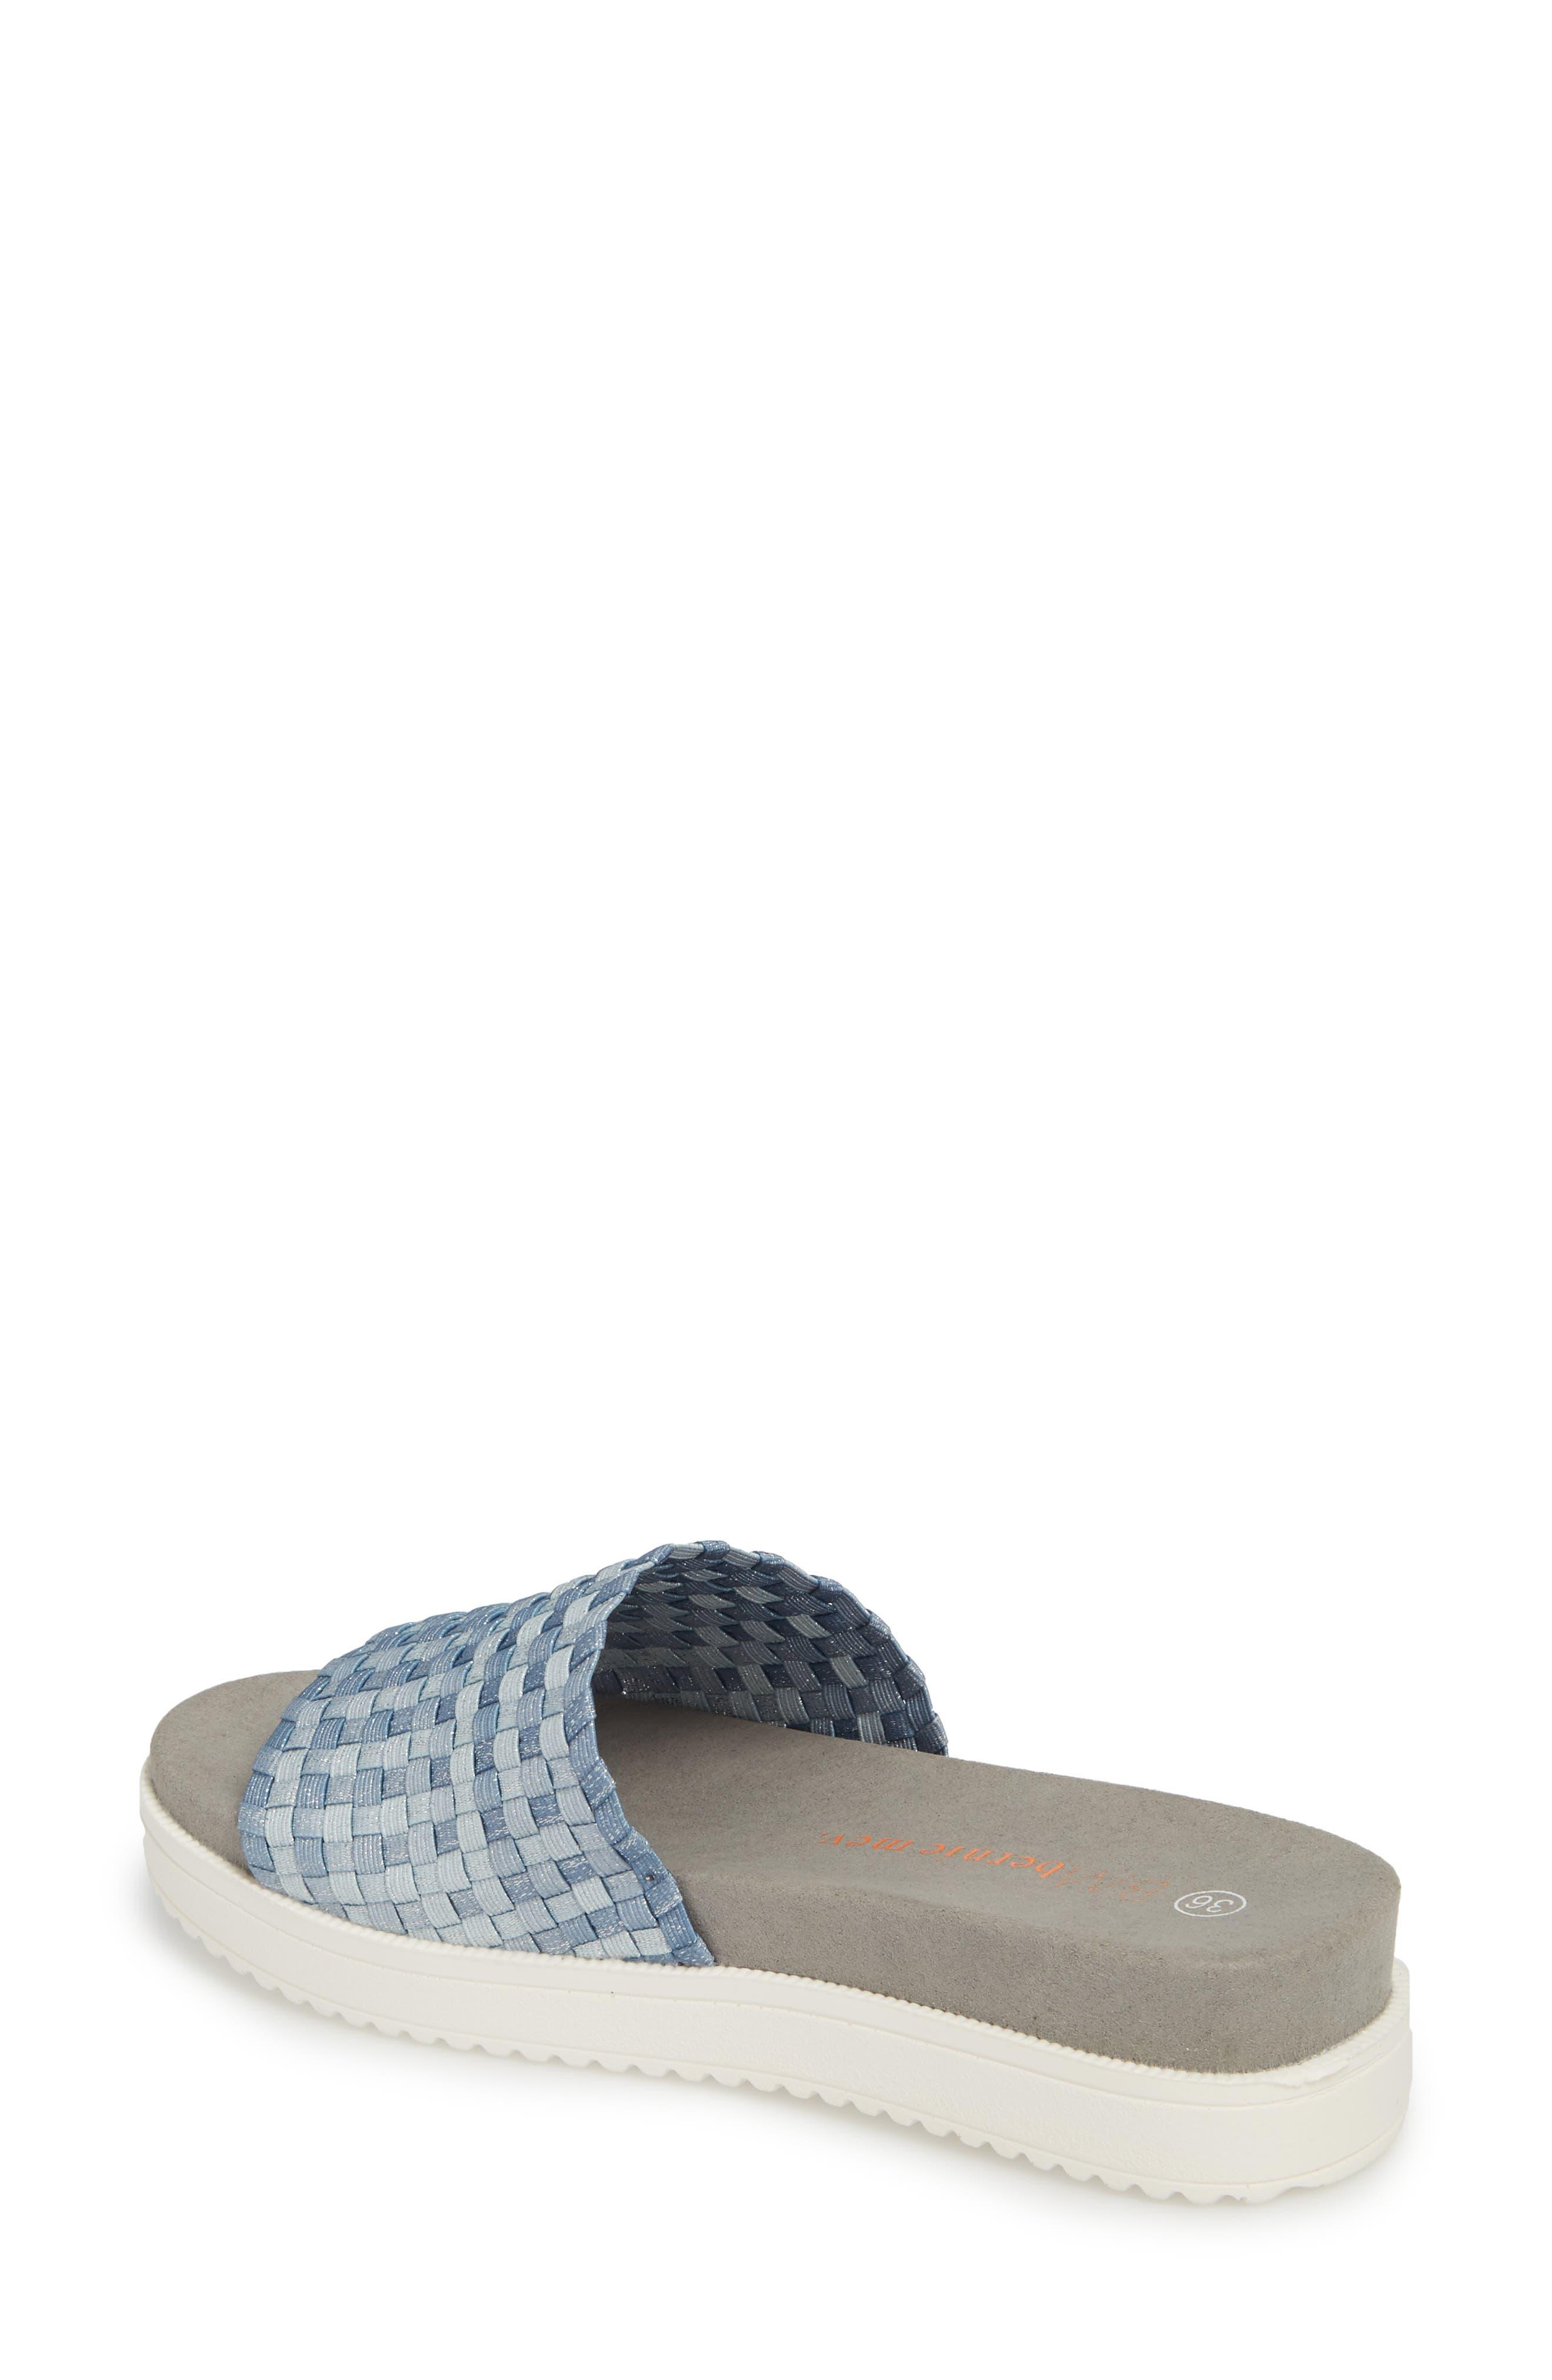 BERNIE MEV.,                             Capri Slide Sandal,                             Alternate thumbnail 2, color,                             CLOUD SHIMMER FABRIC